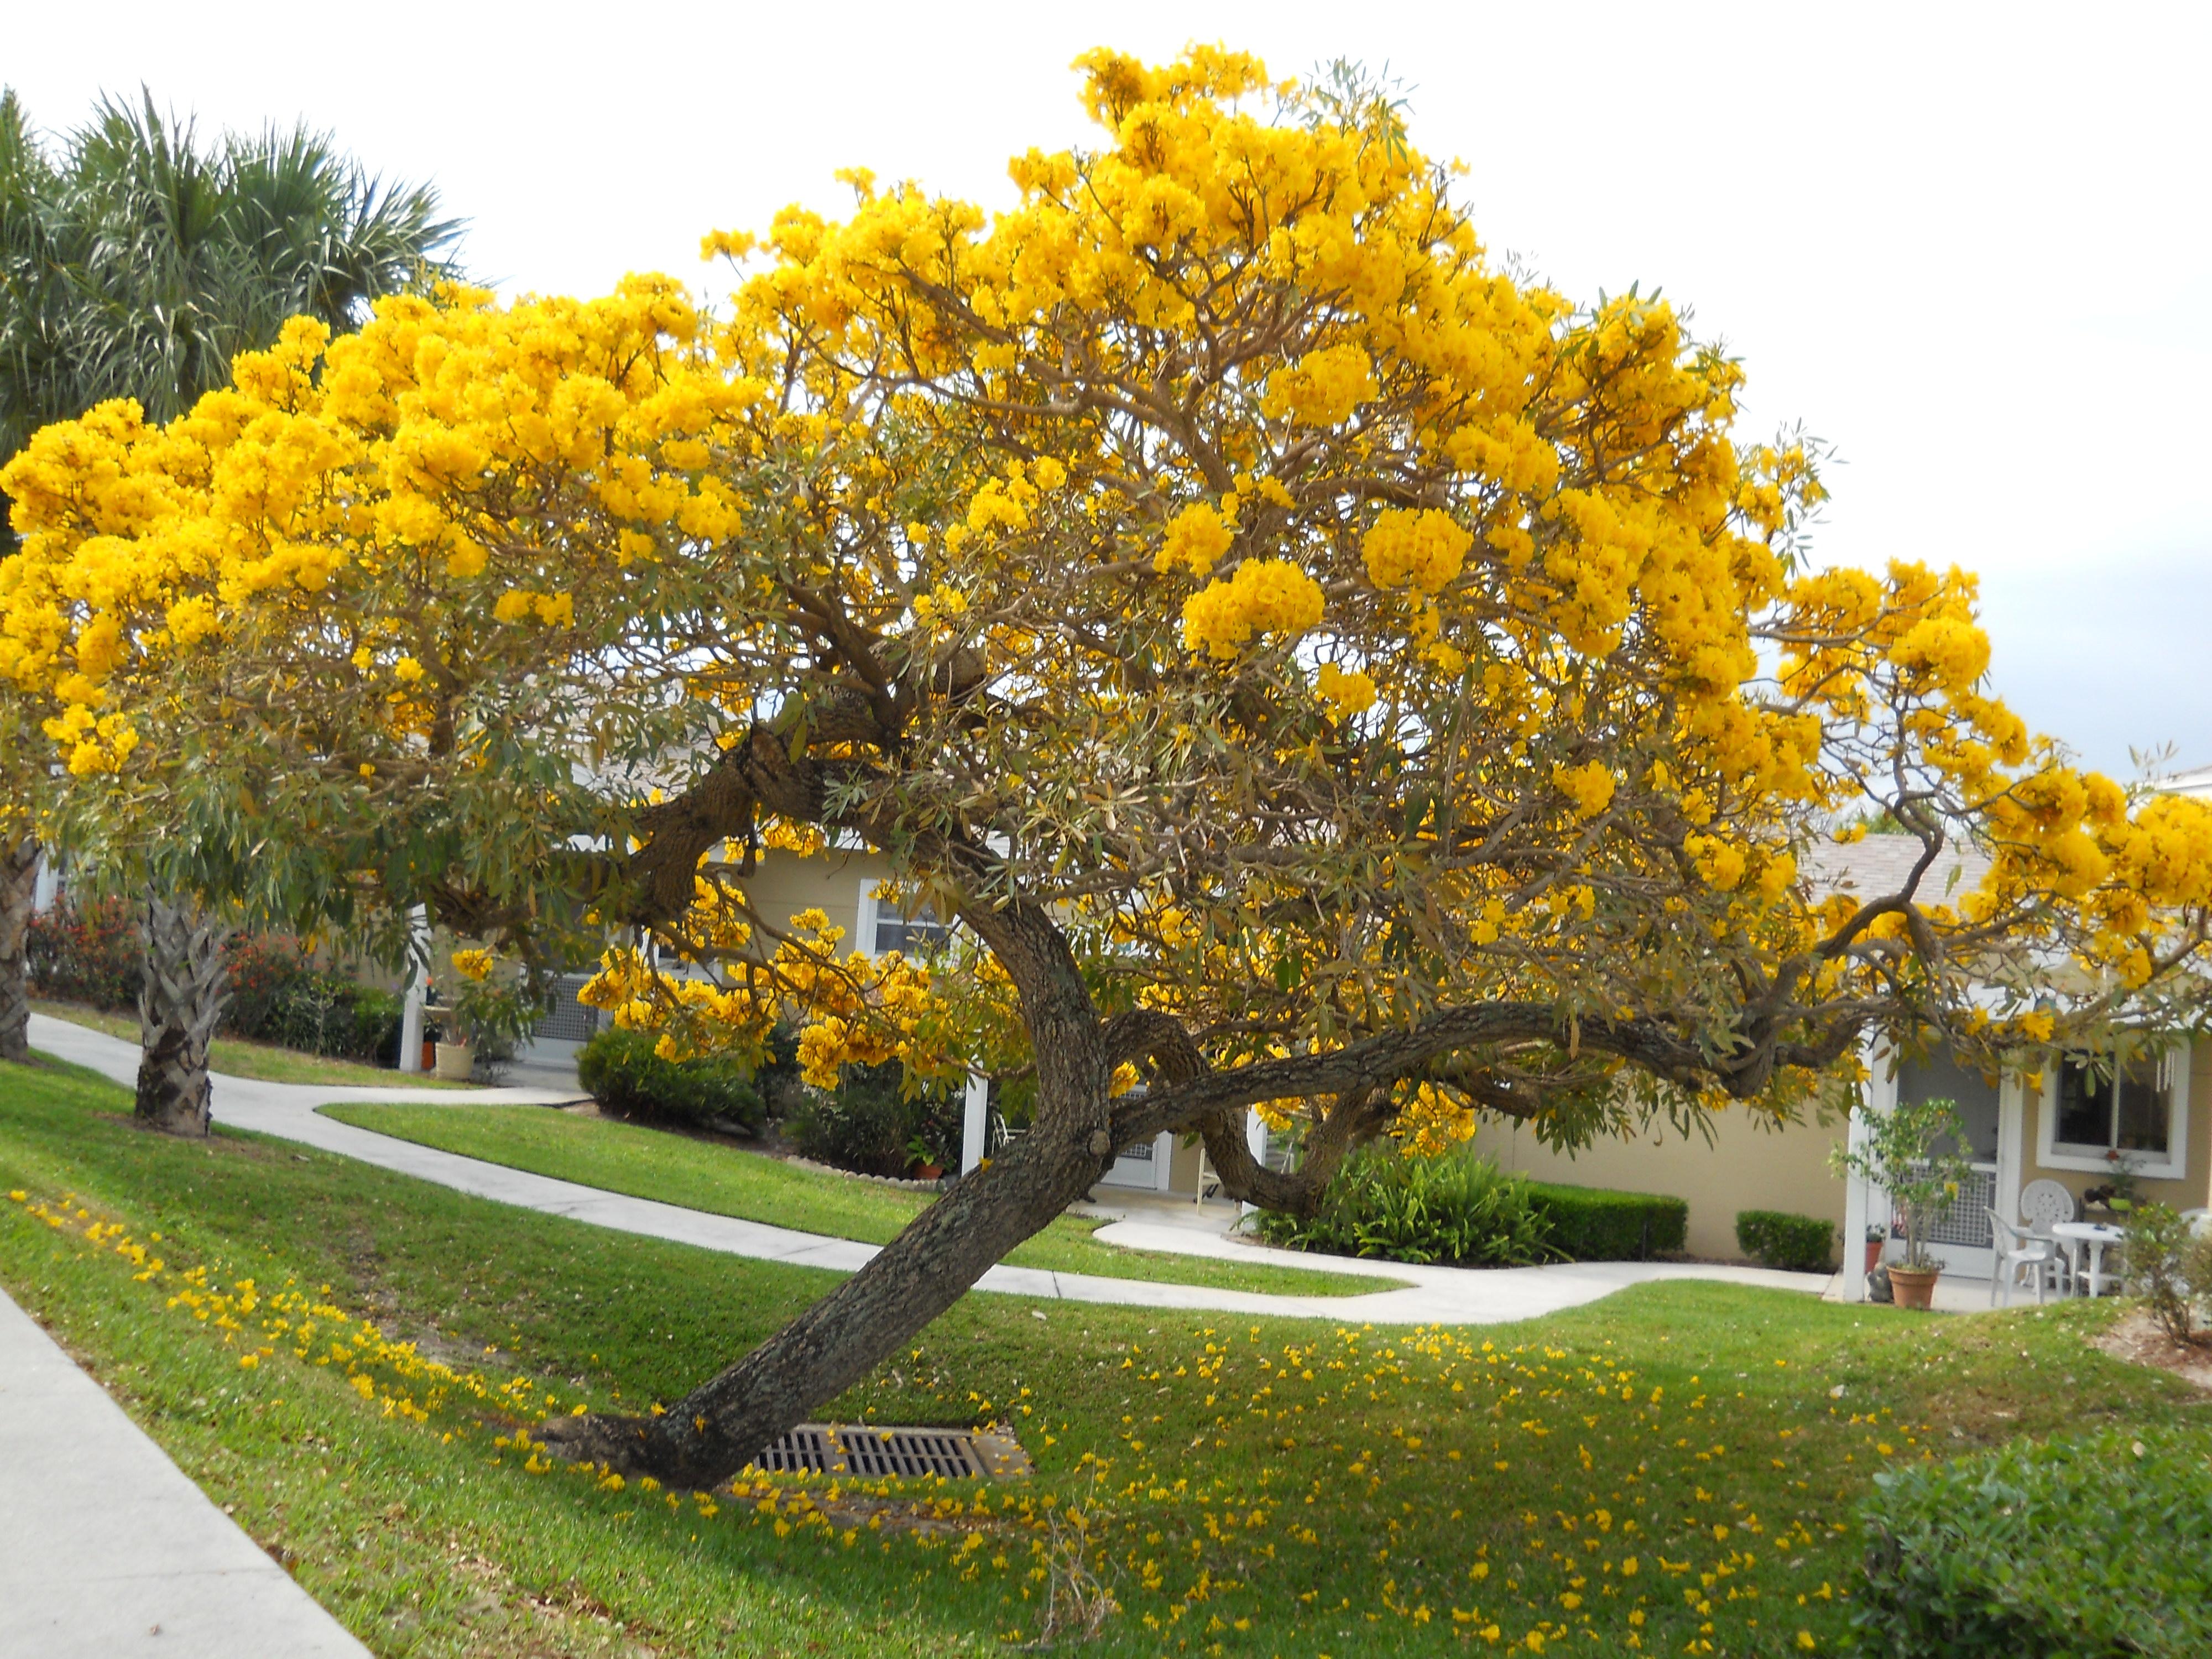 Cledercollares nucleopedagogico franca for Arboles bonitos para jardin